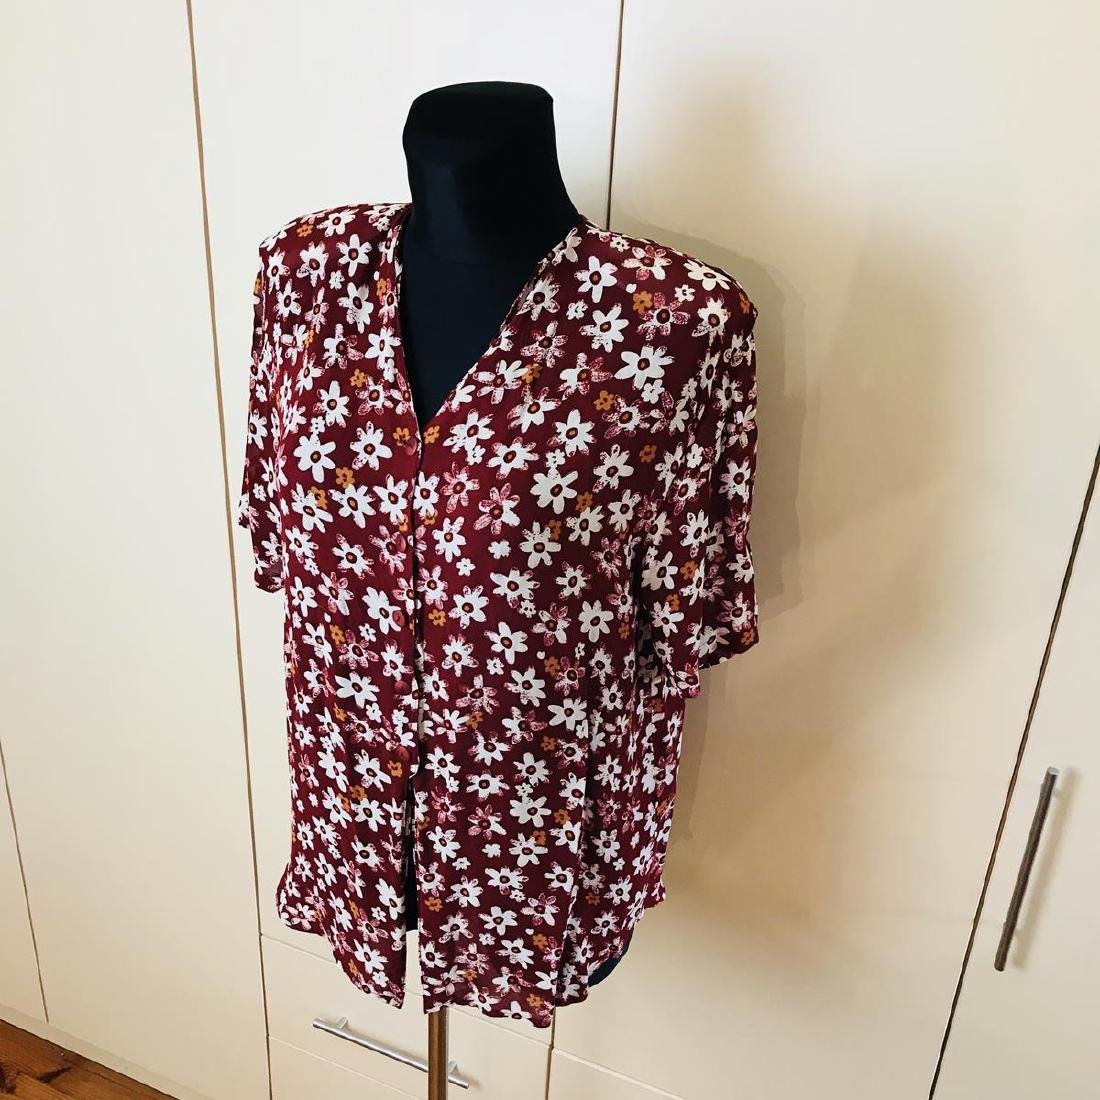 Vintage Women's Bellissima Designer Blouse Shirt Top - 3